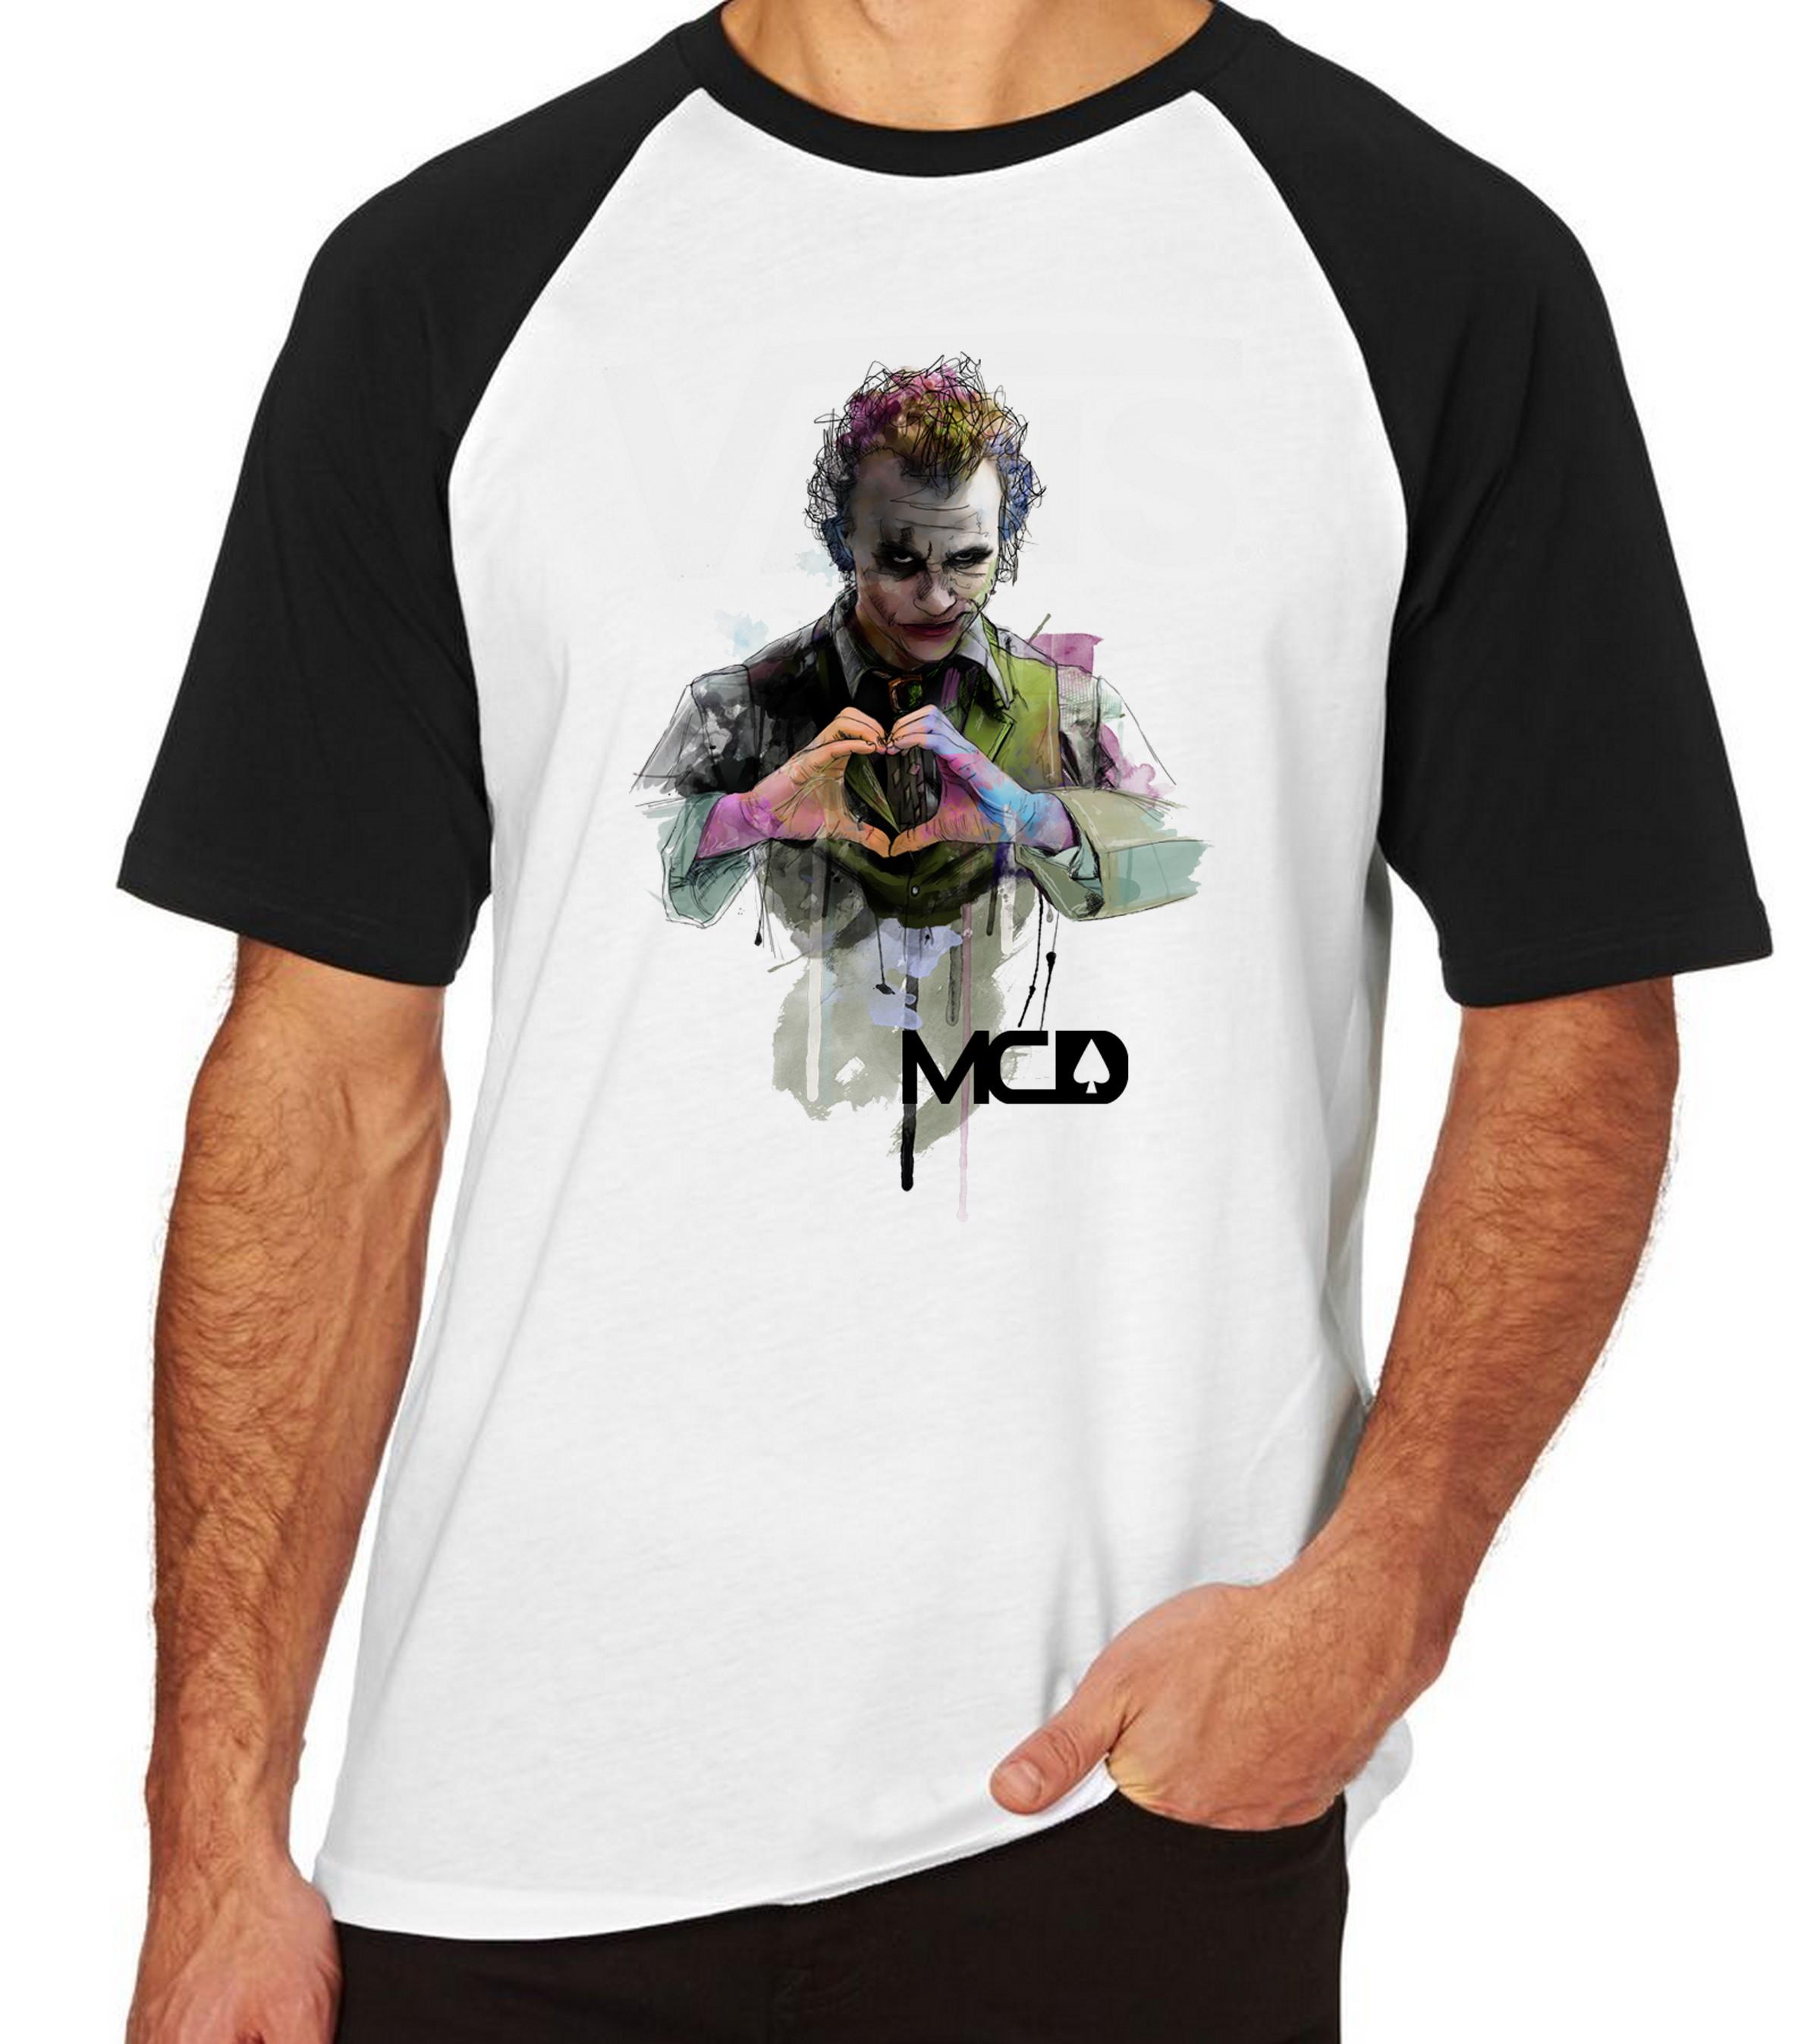 Camiseta Mcd  11bec36846a